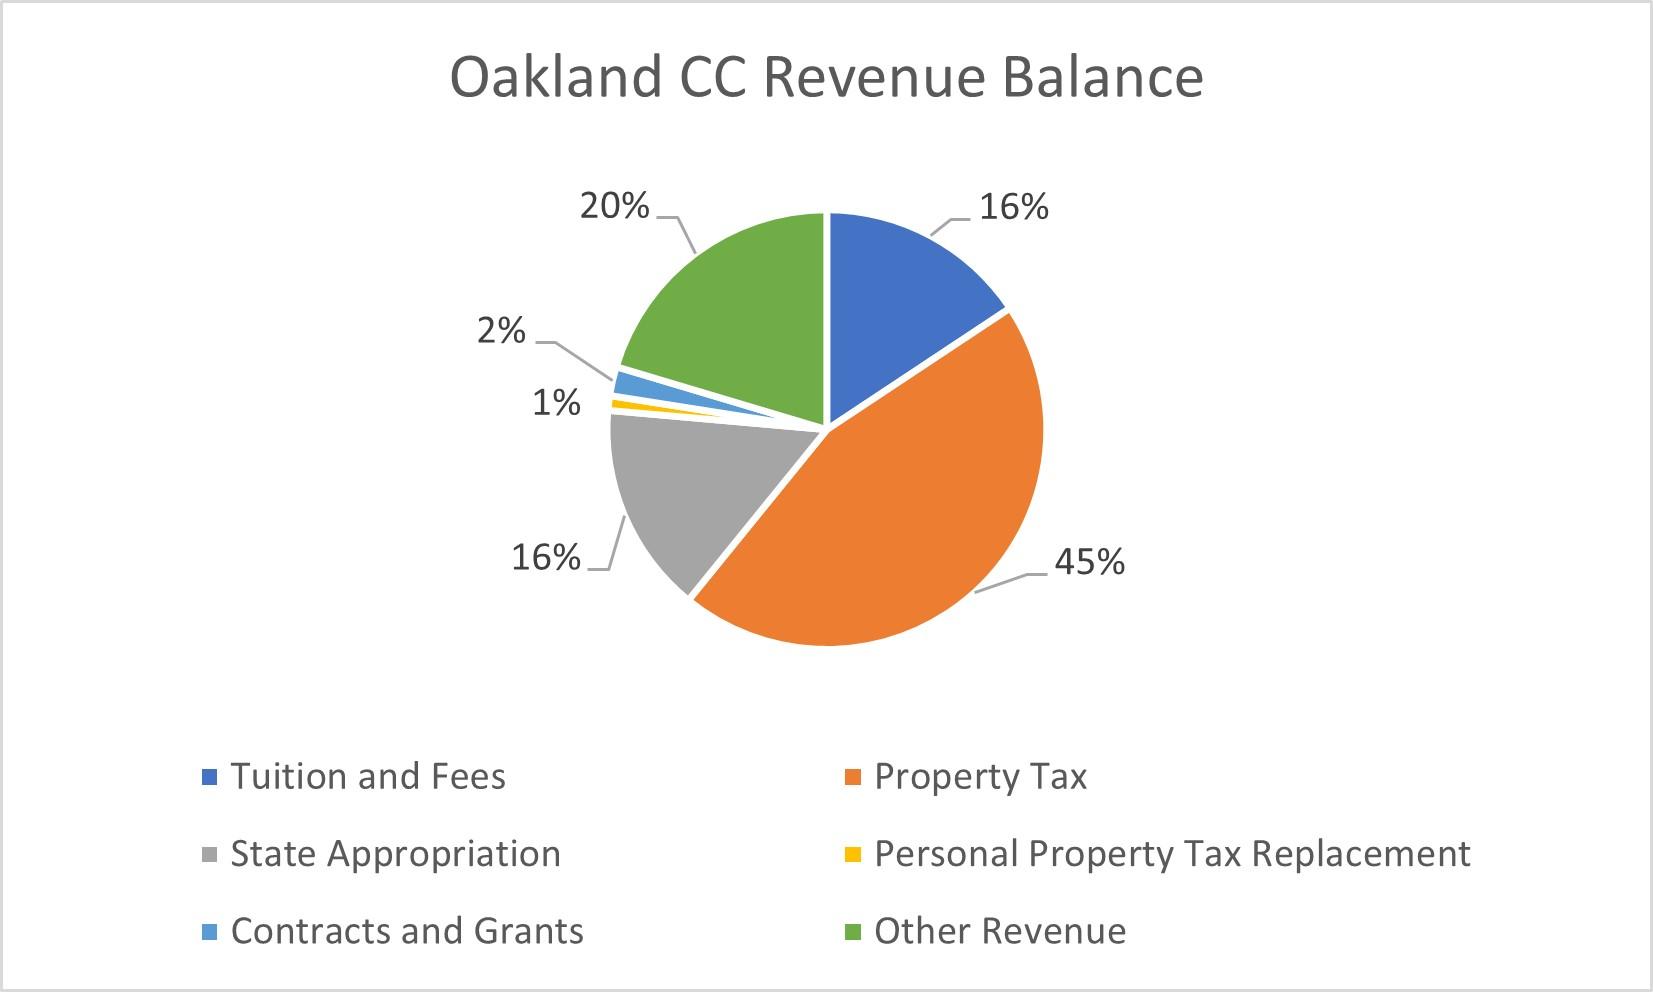 Oakland Community College revenue balance